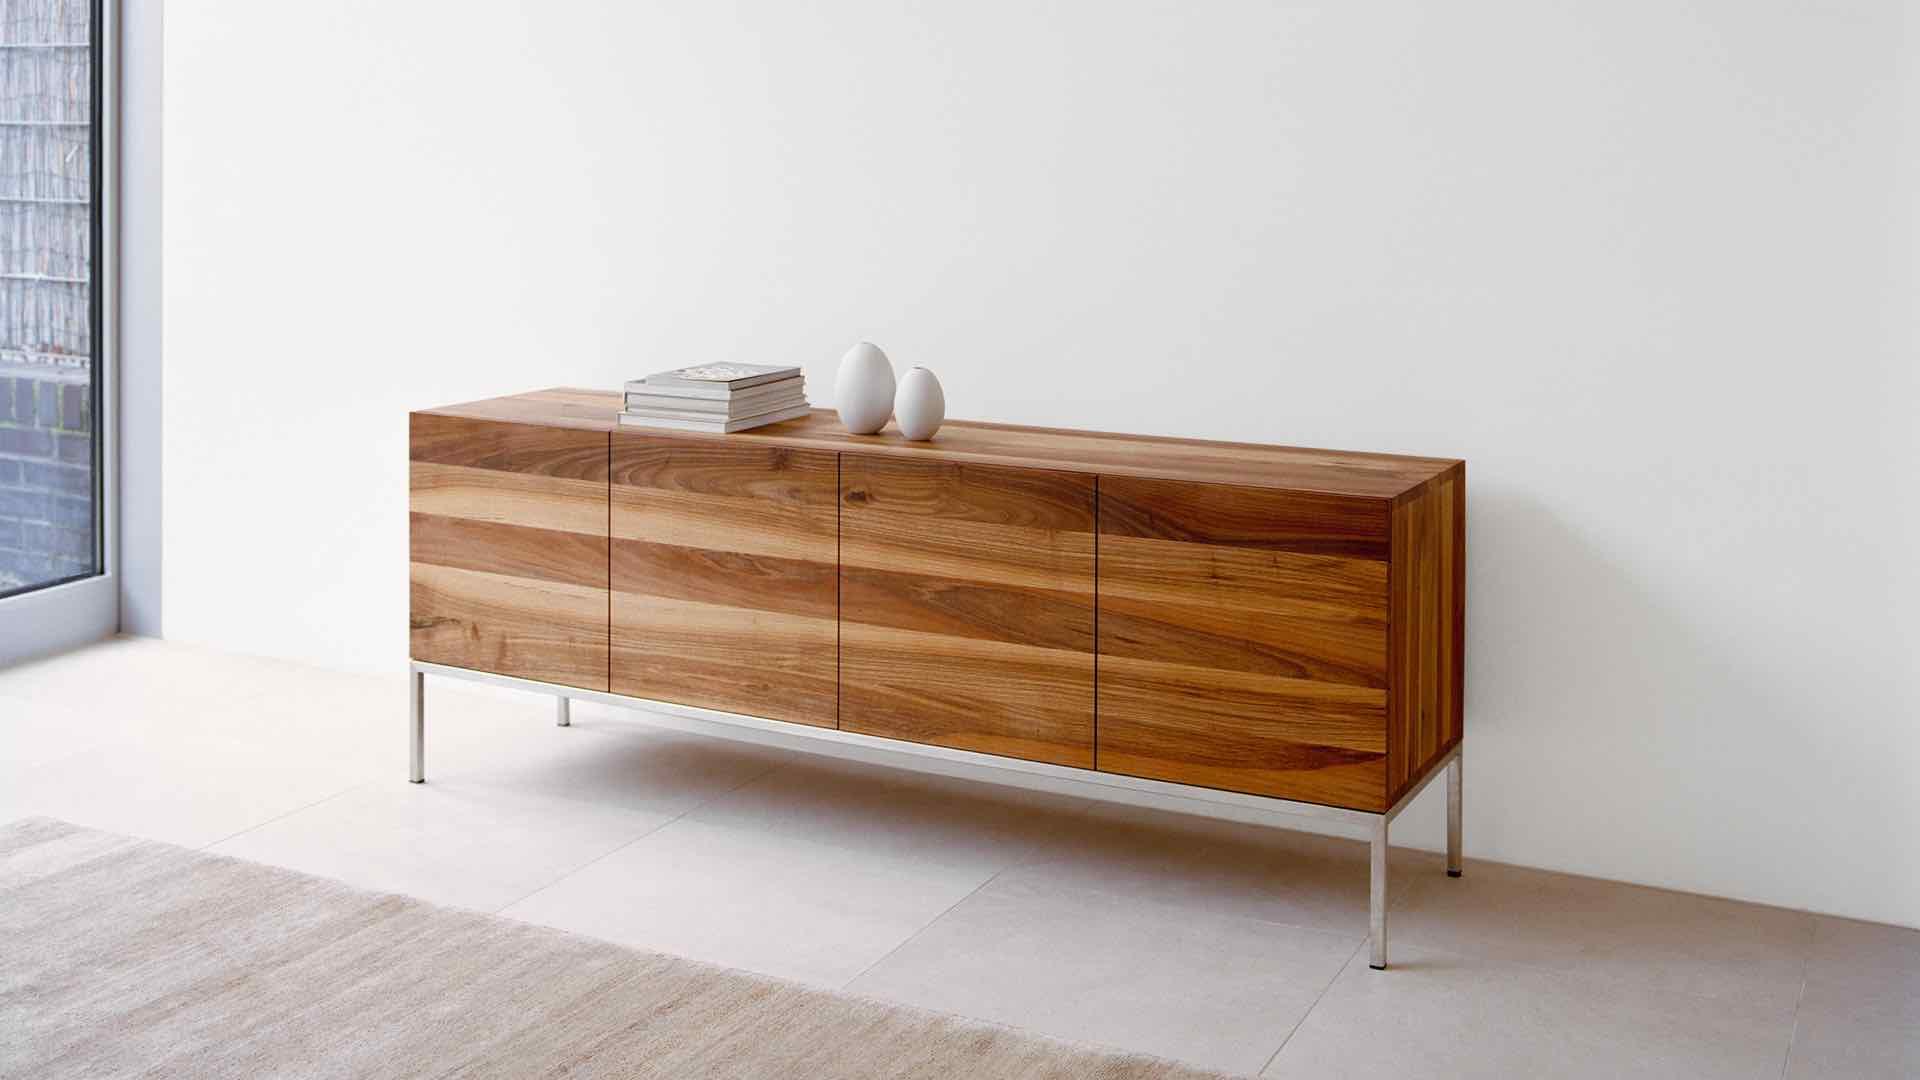 felix thonet shop e15 farah anrichte. Black Bedroom Furniture Sets. Home Design Ideas